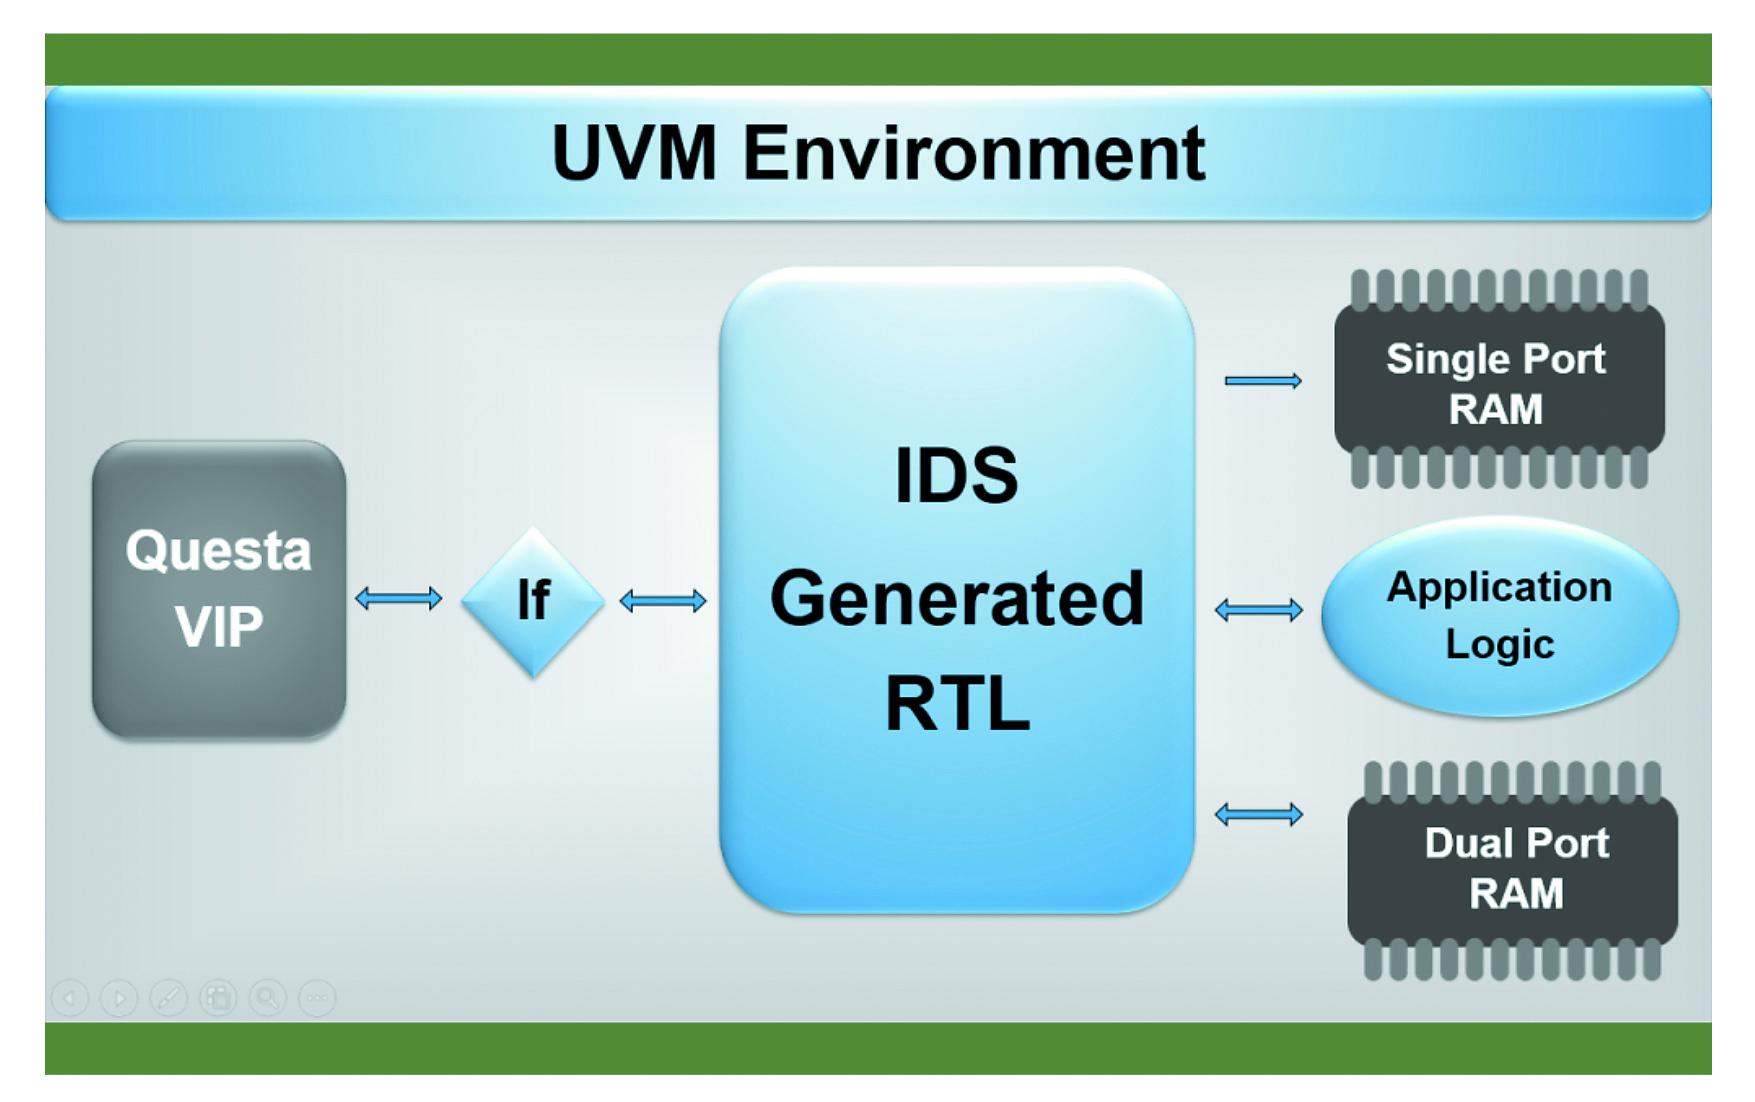 UVM Environment